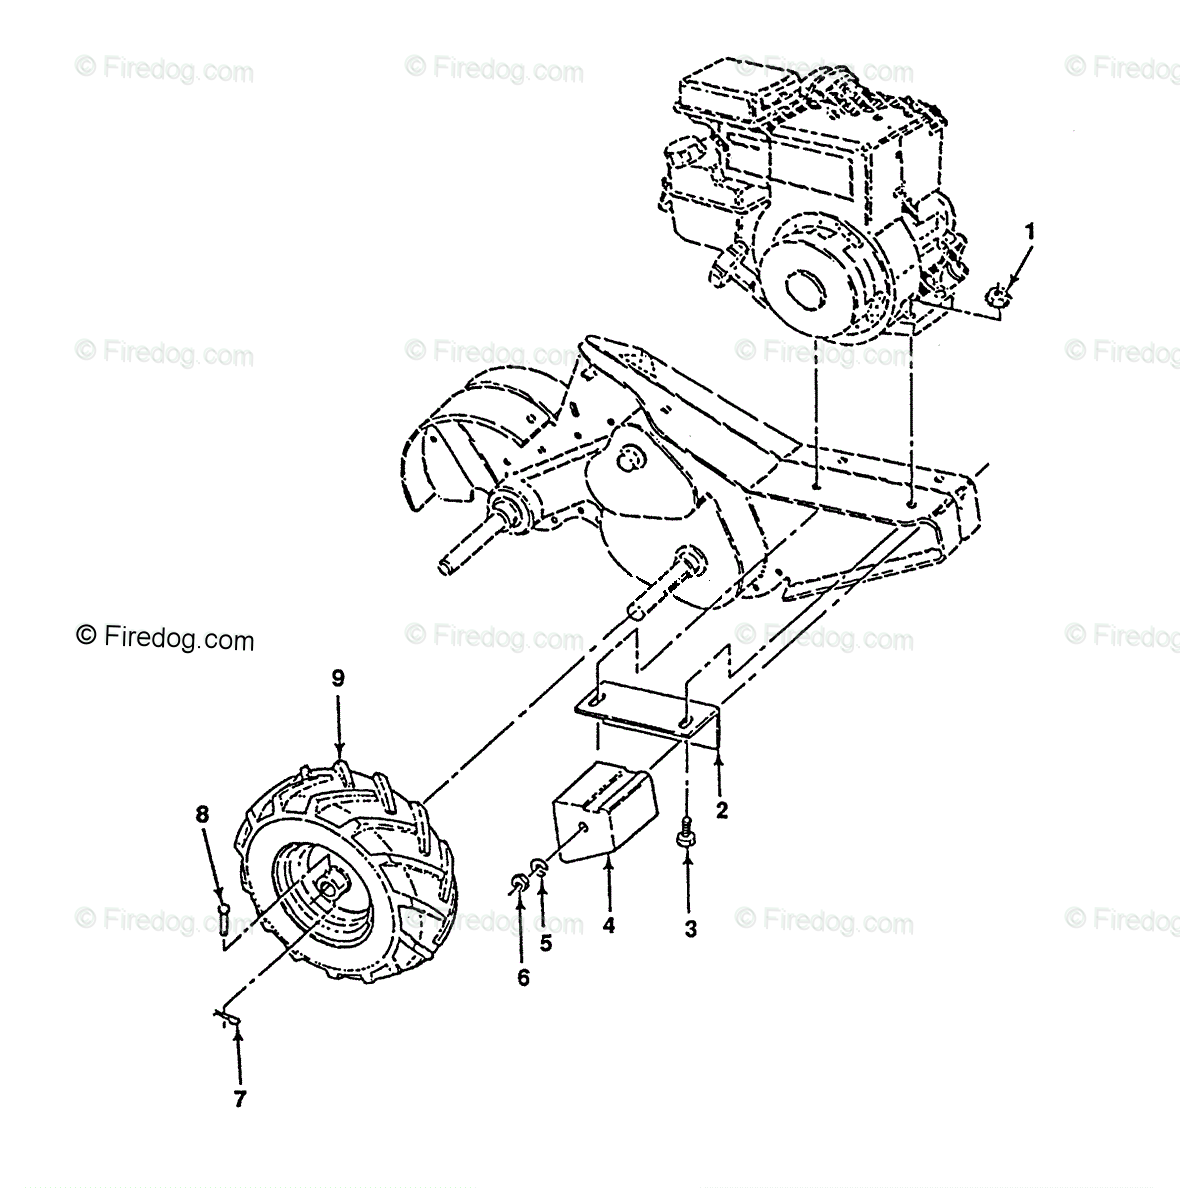 MTQ0OTg2NQ 58892fdc husqvarna tiller parts diagram wiring diagrams